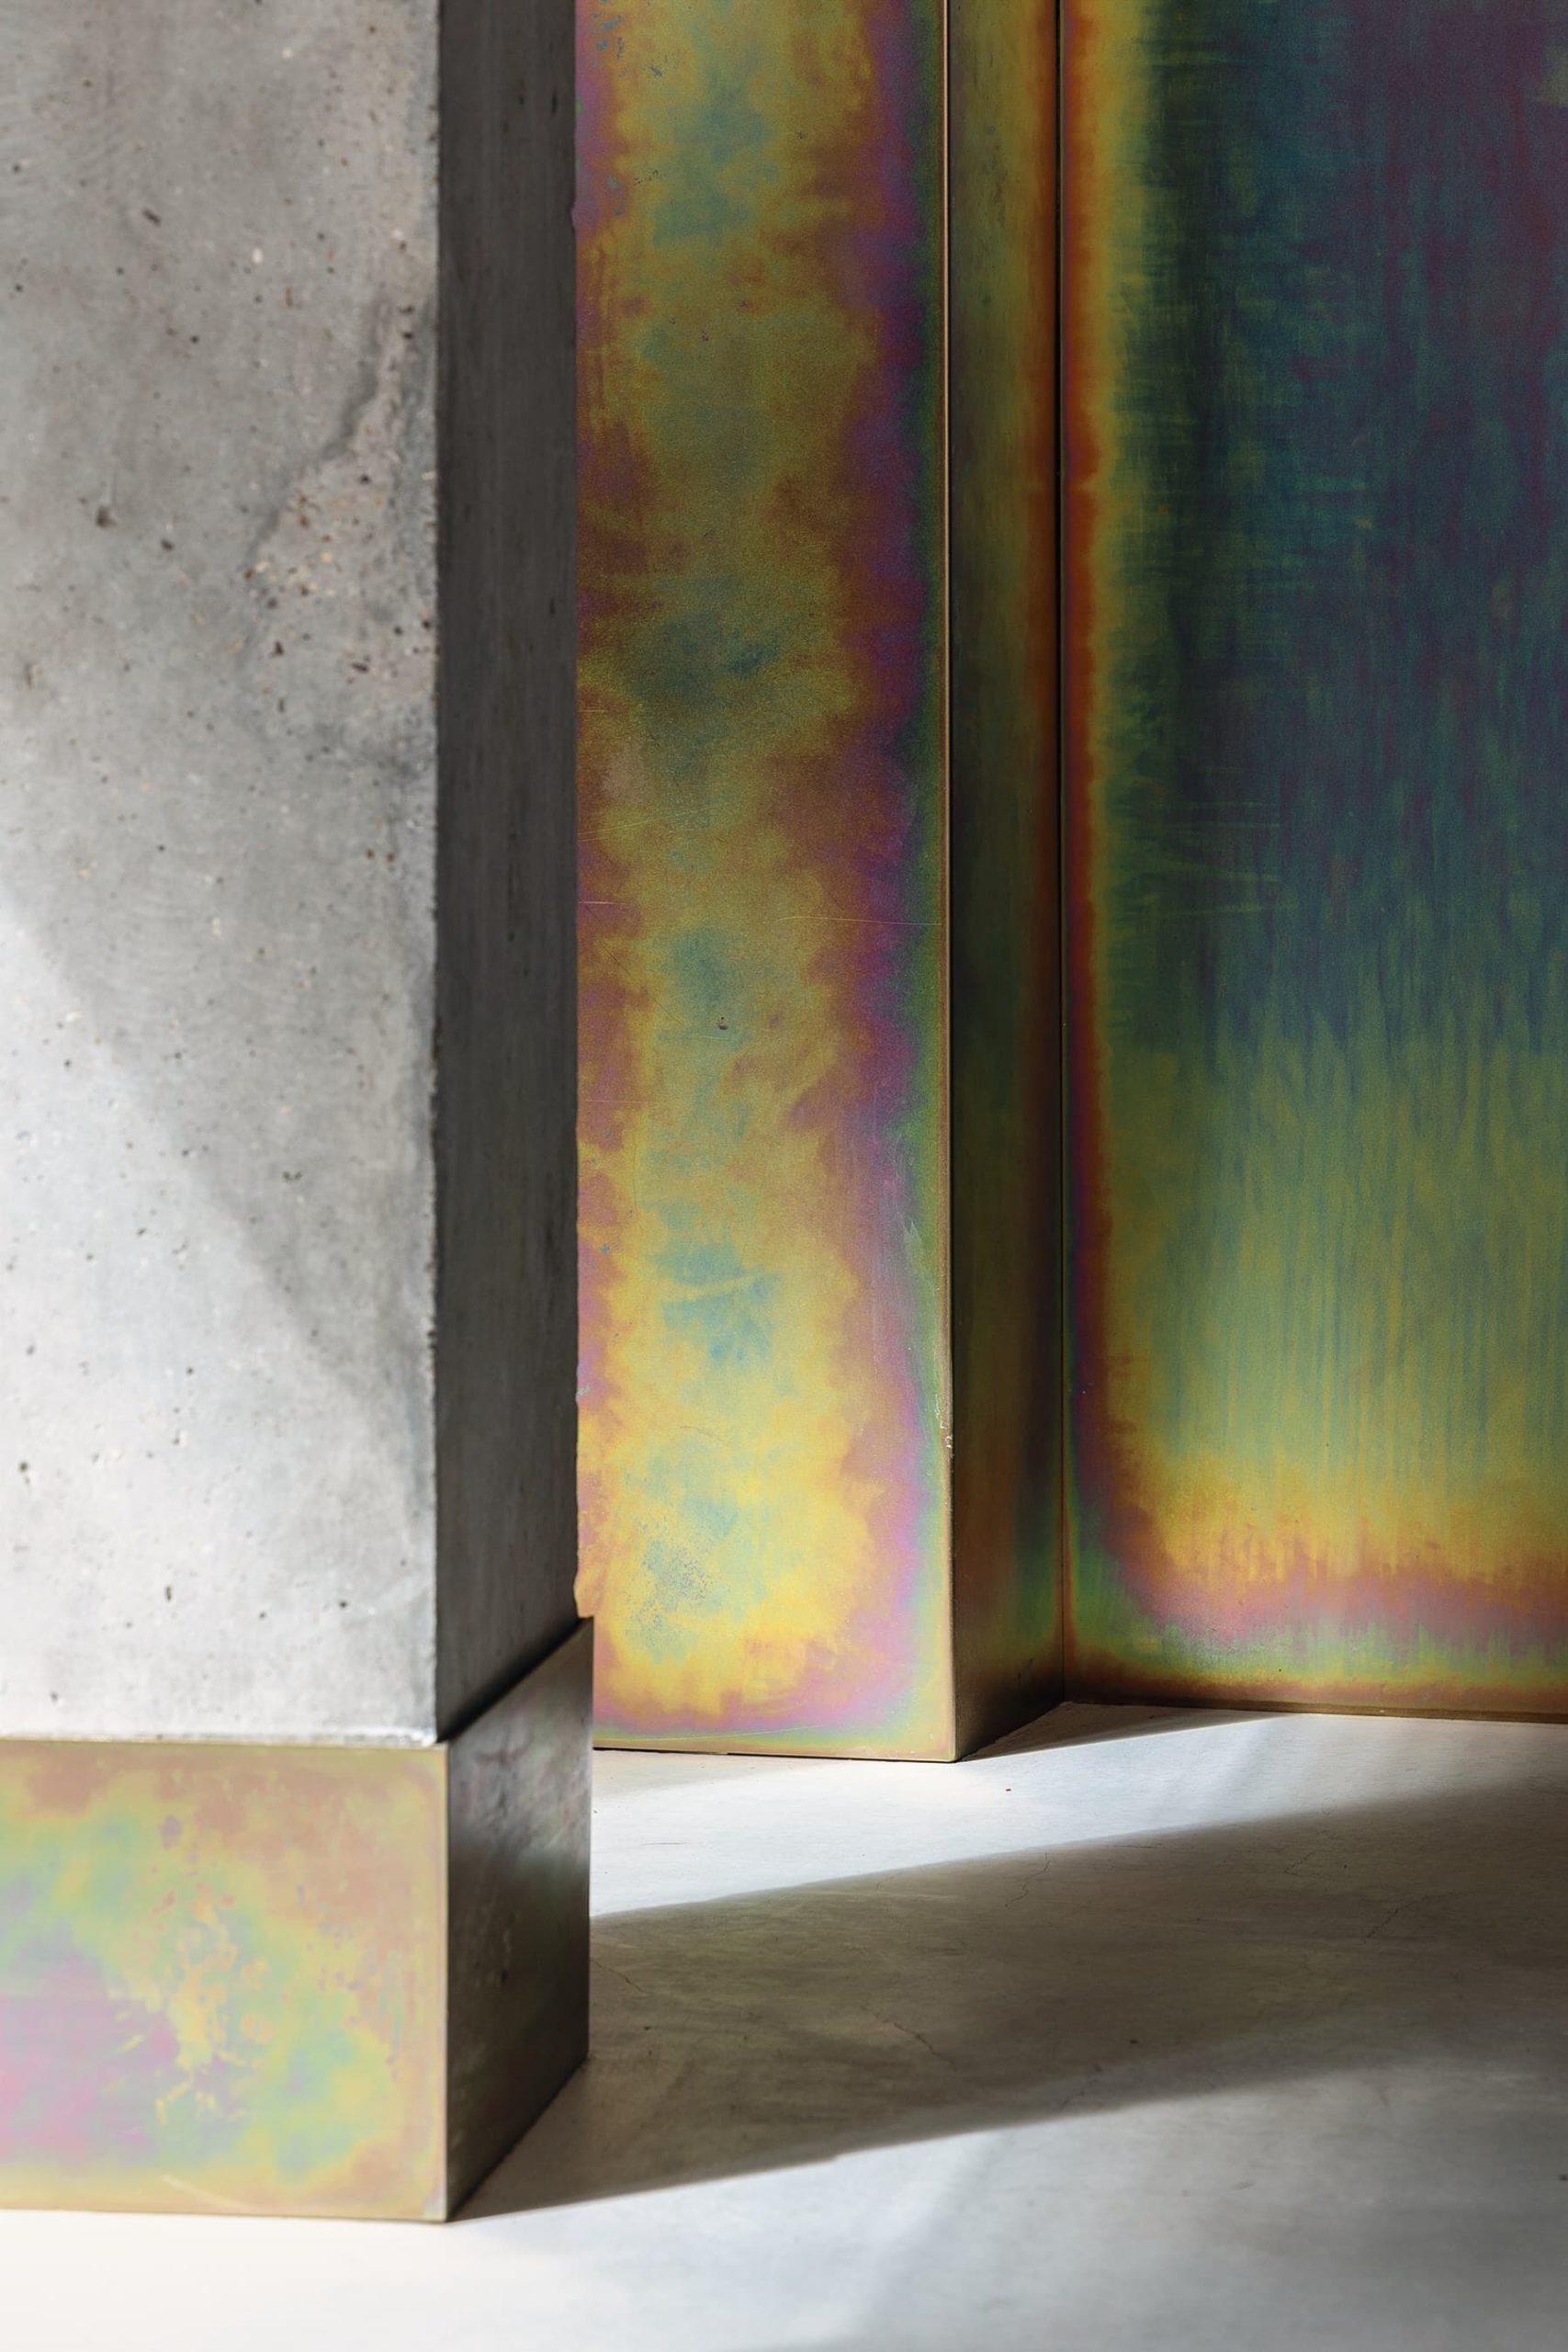 Holloway Li, Bermonds Locke London, Material Vignettes | Yellowtrace